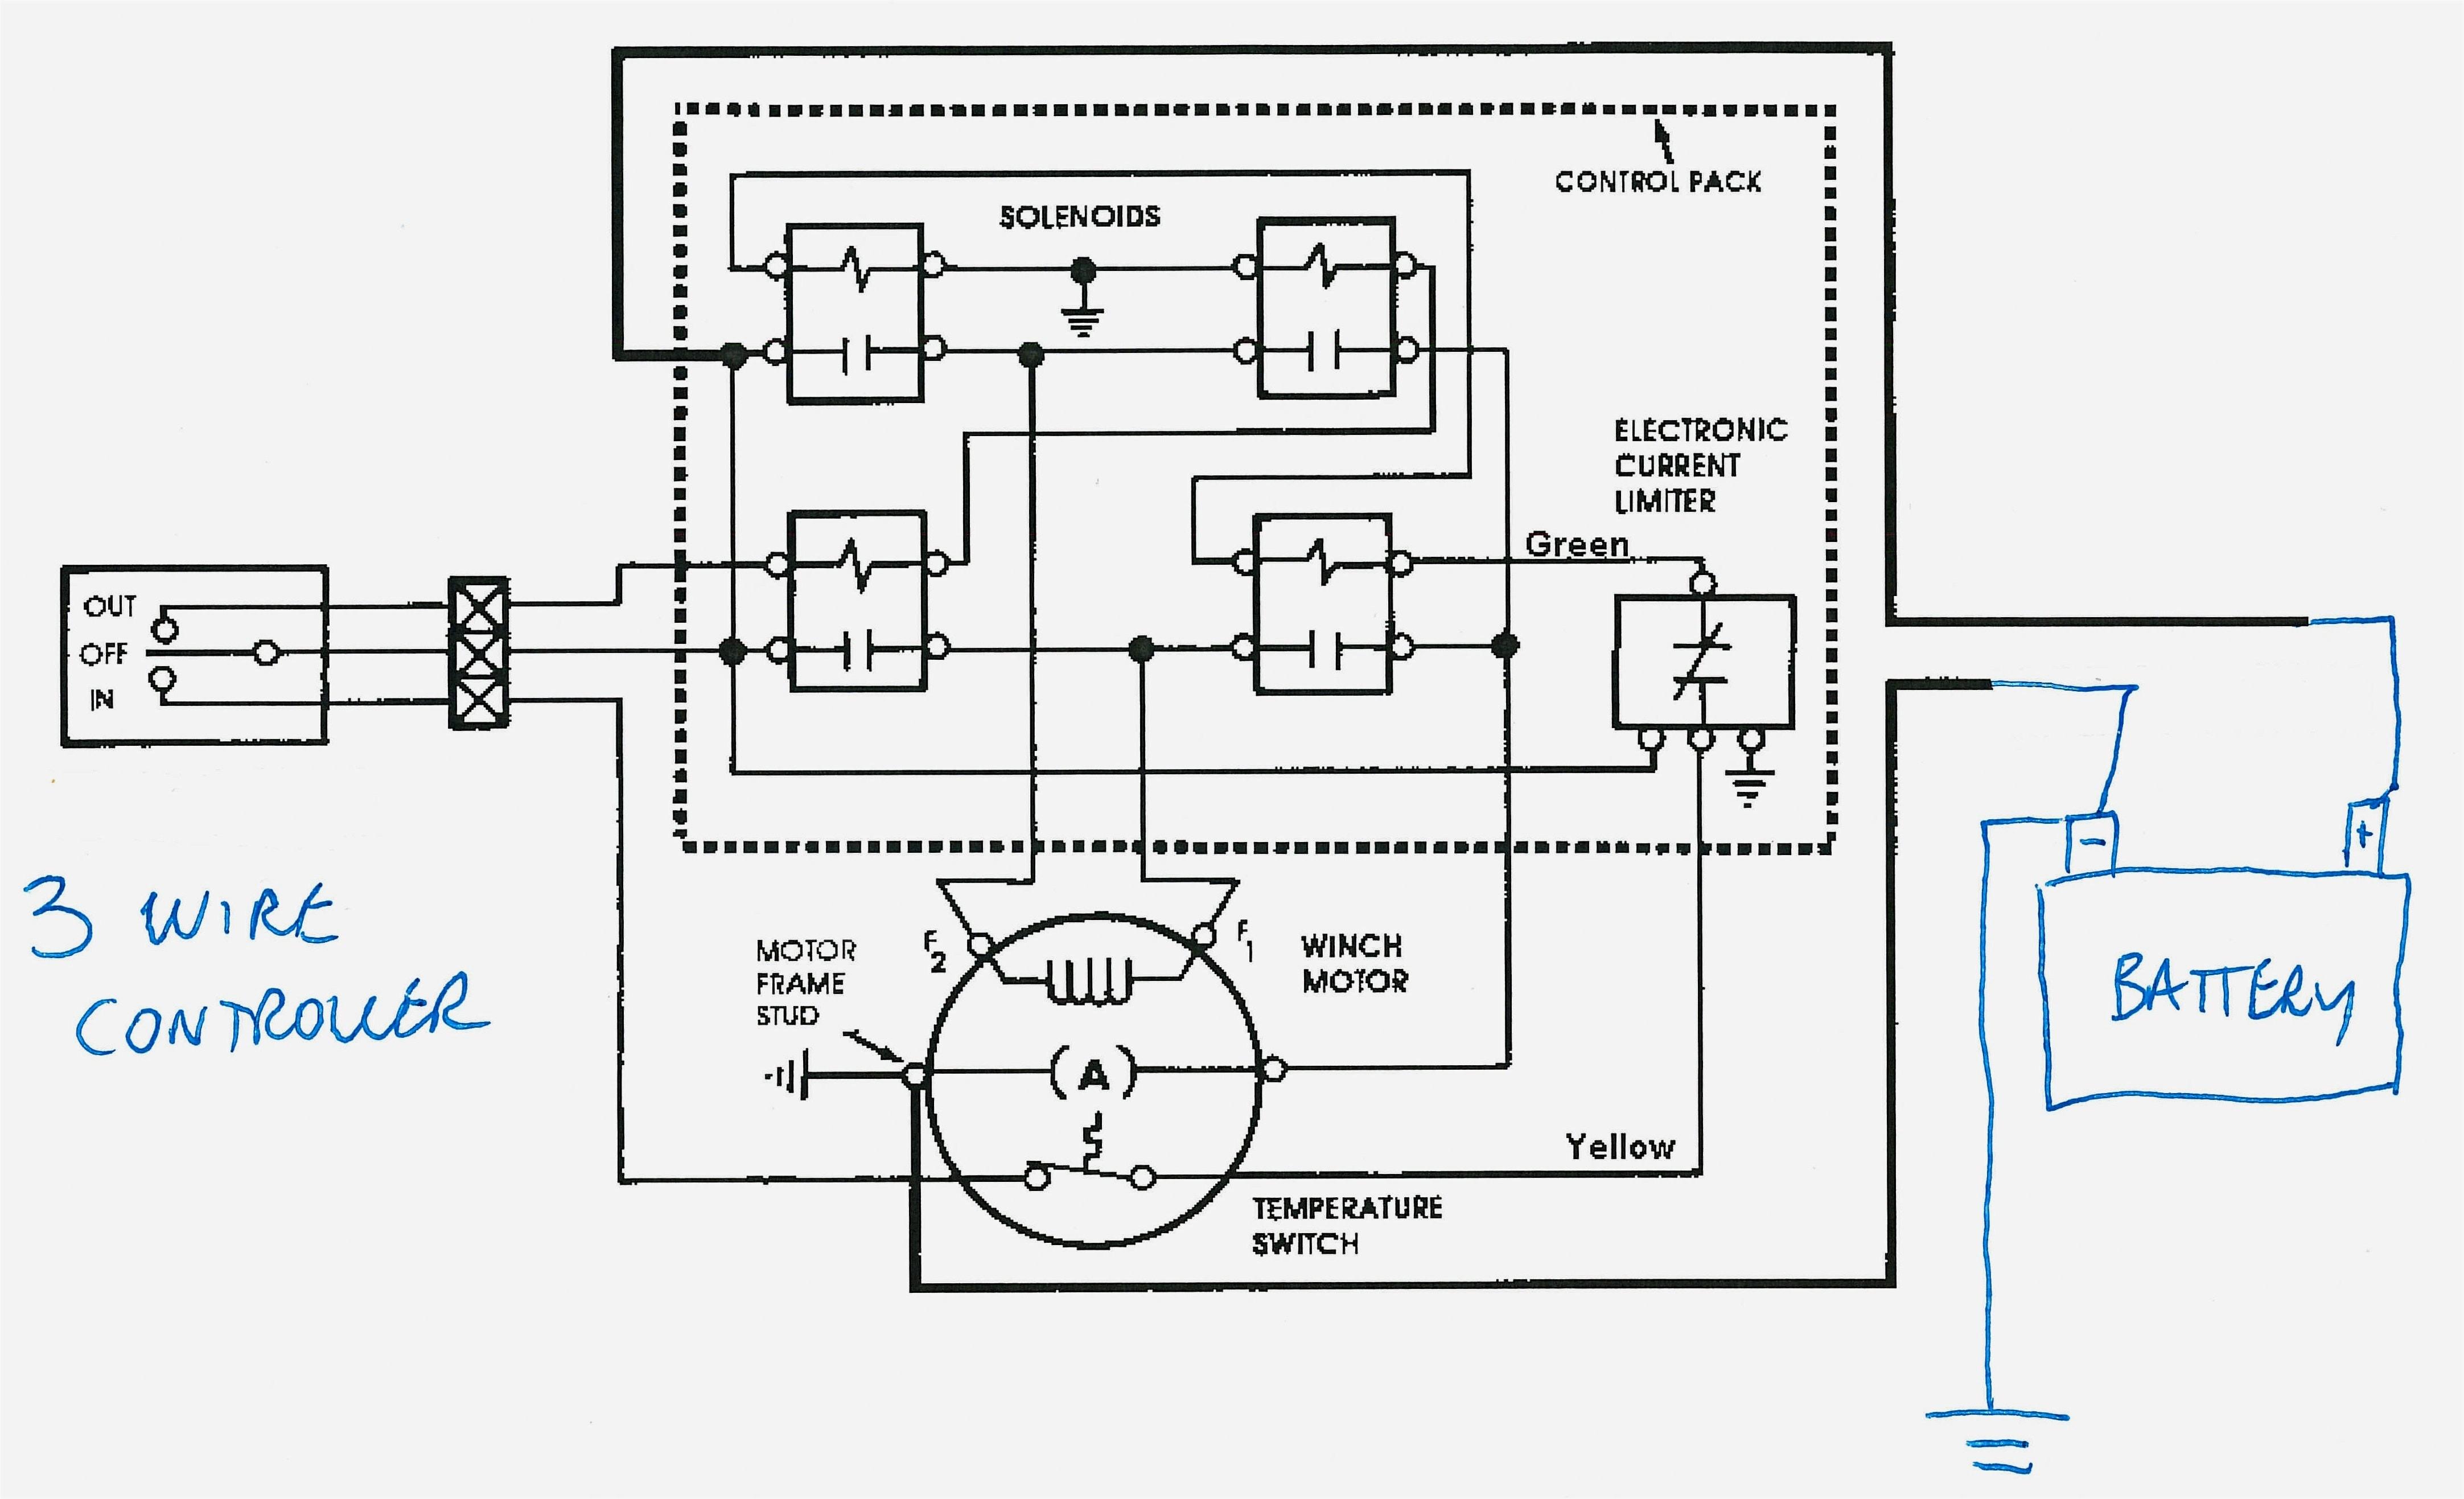 Warn Winch Contactor Wiring Diagram At Webtor Me Throughout Kfi Random 2